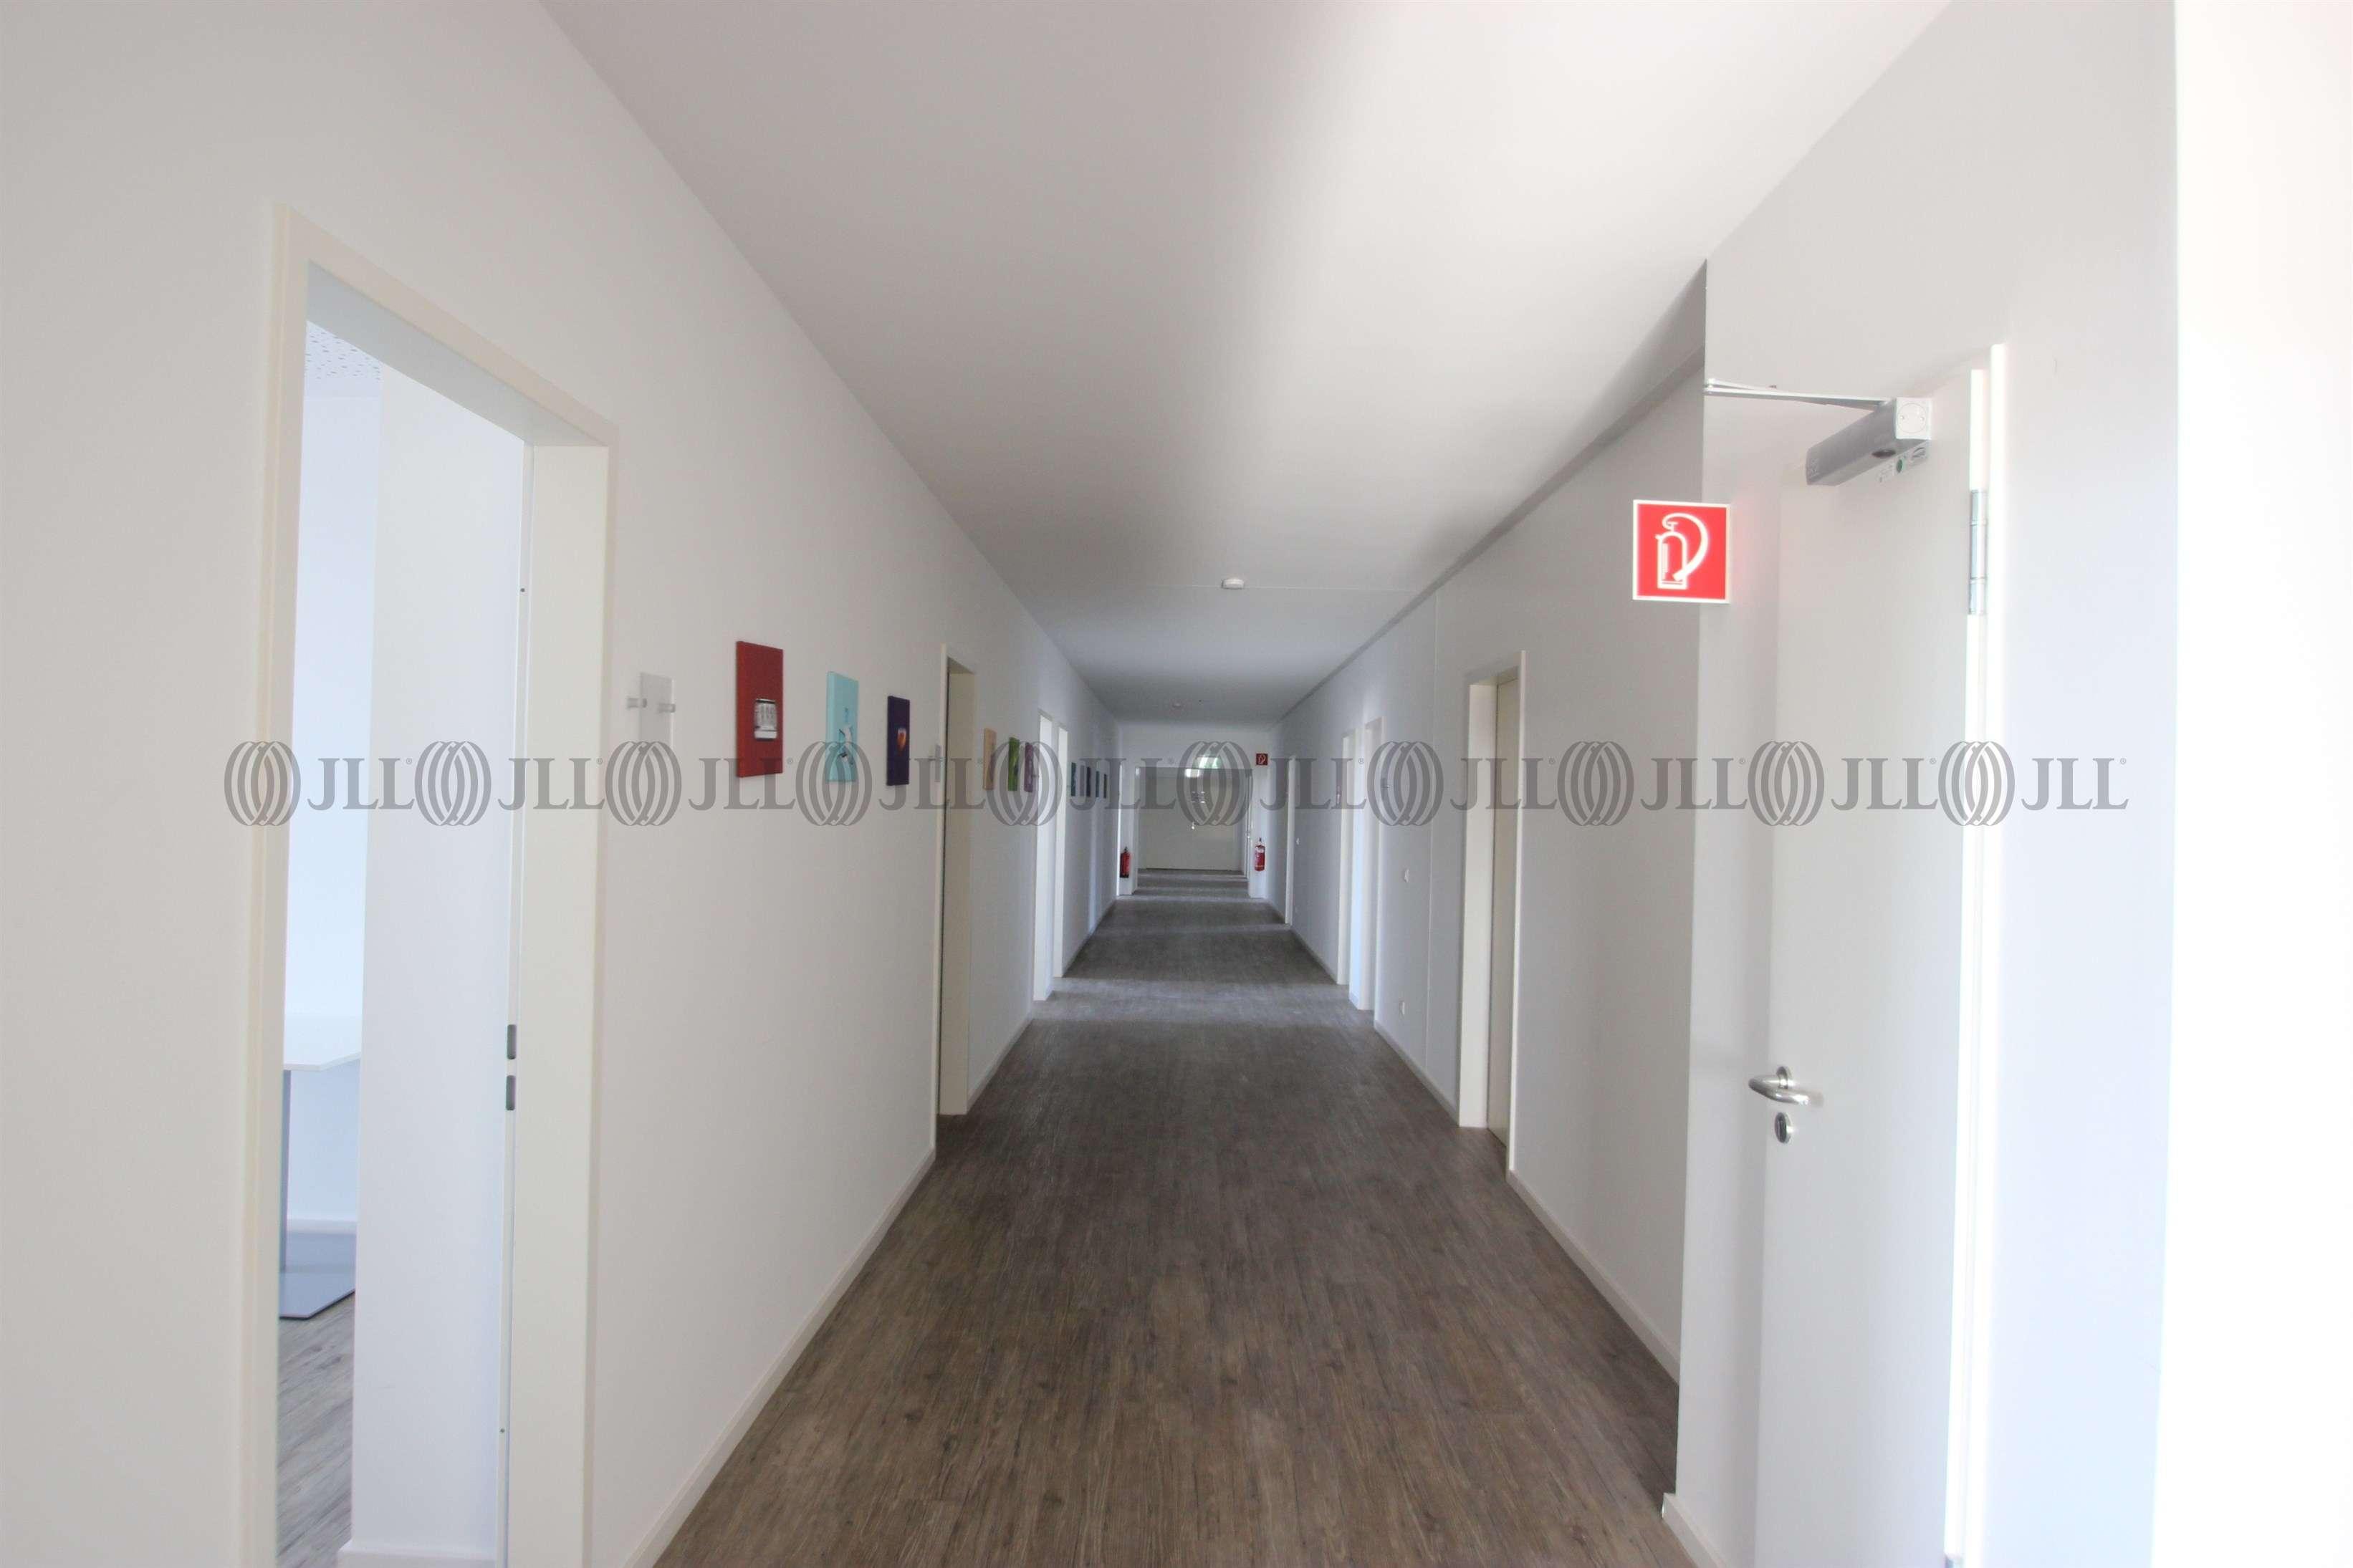 Büros Frankfurt am main, 60314 - Büro - Frankfurt am Main, Ostend - F1661 - 10046102